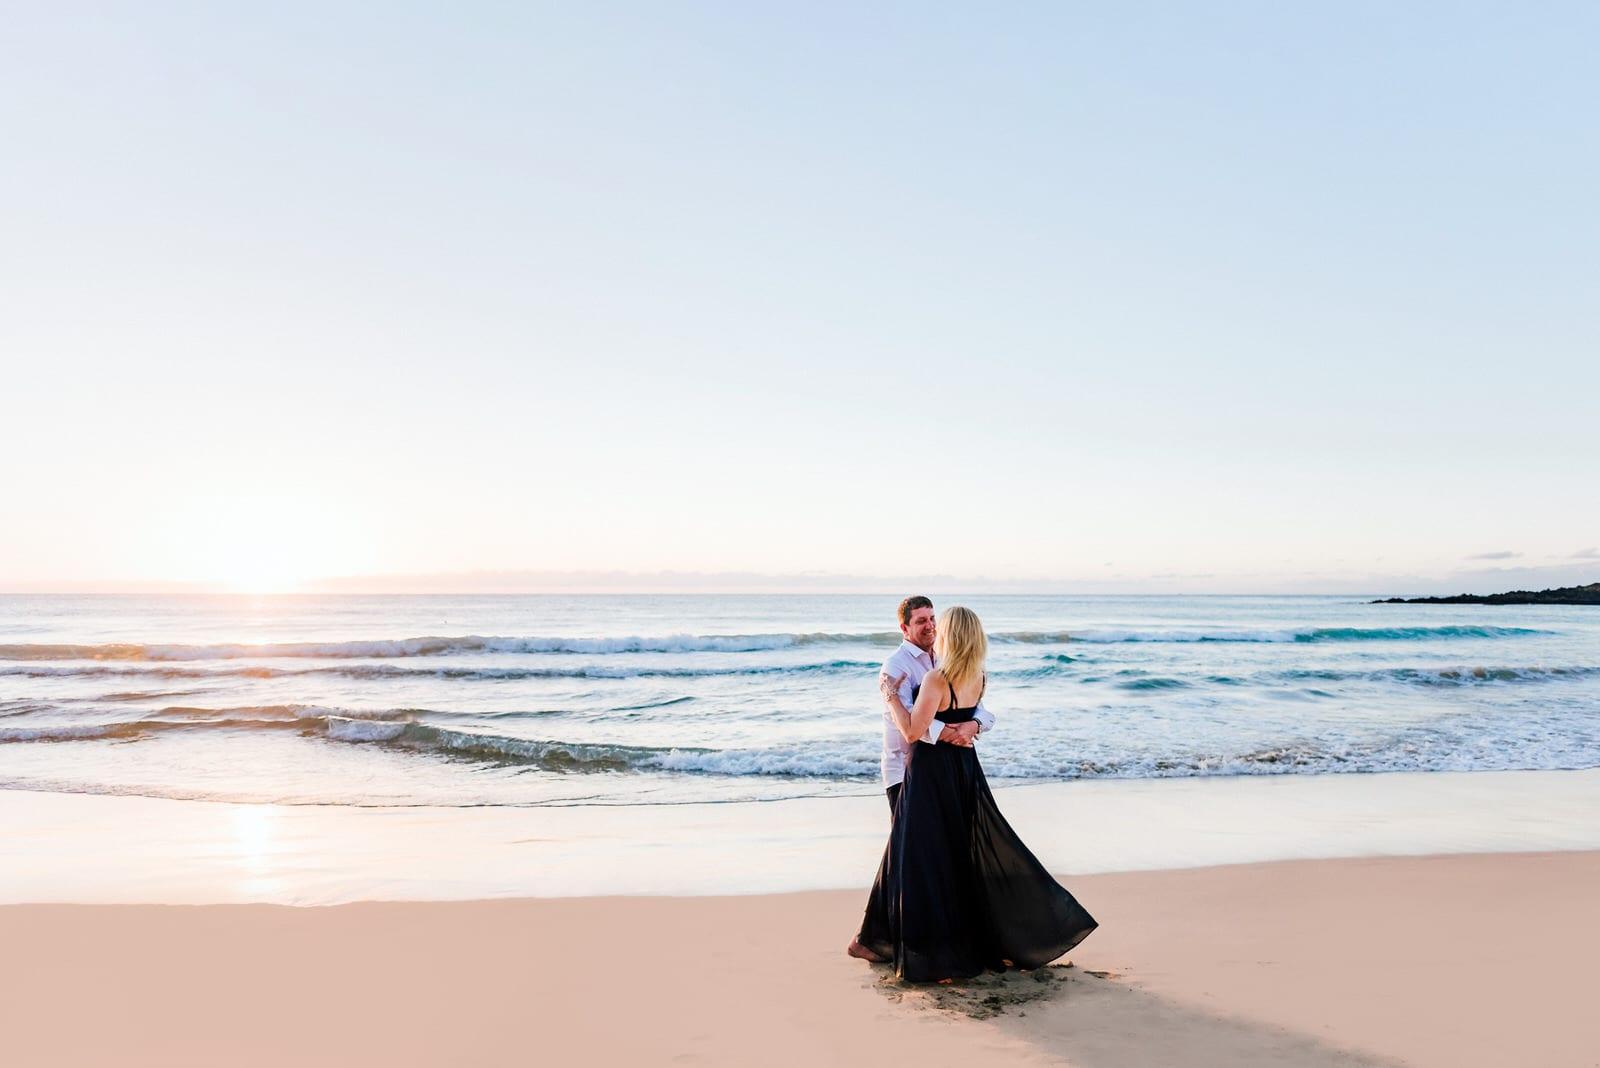 kona-engagement-photographer-navy-dress-sunset-17.jpg